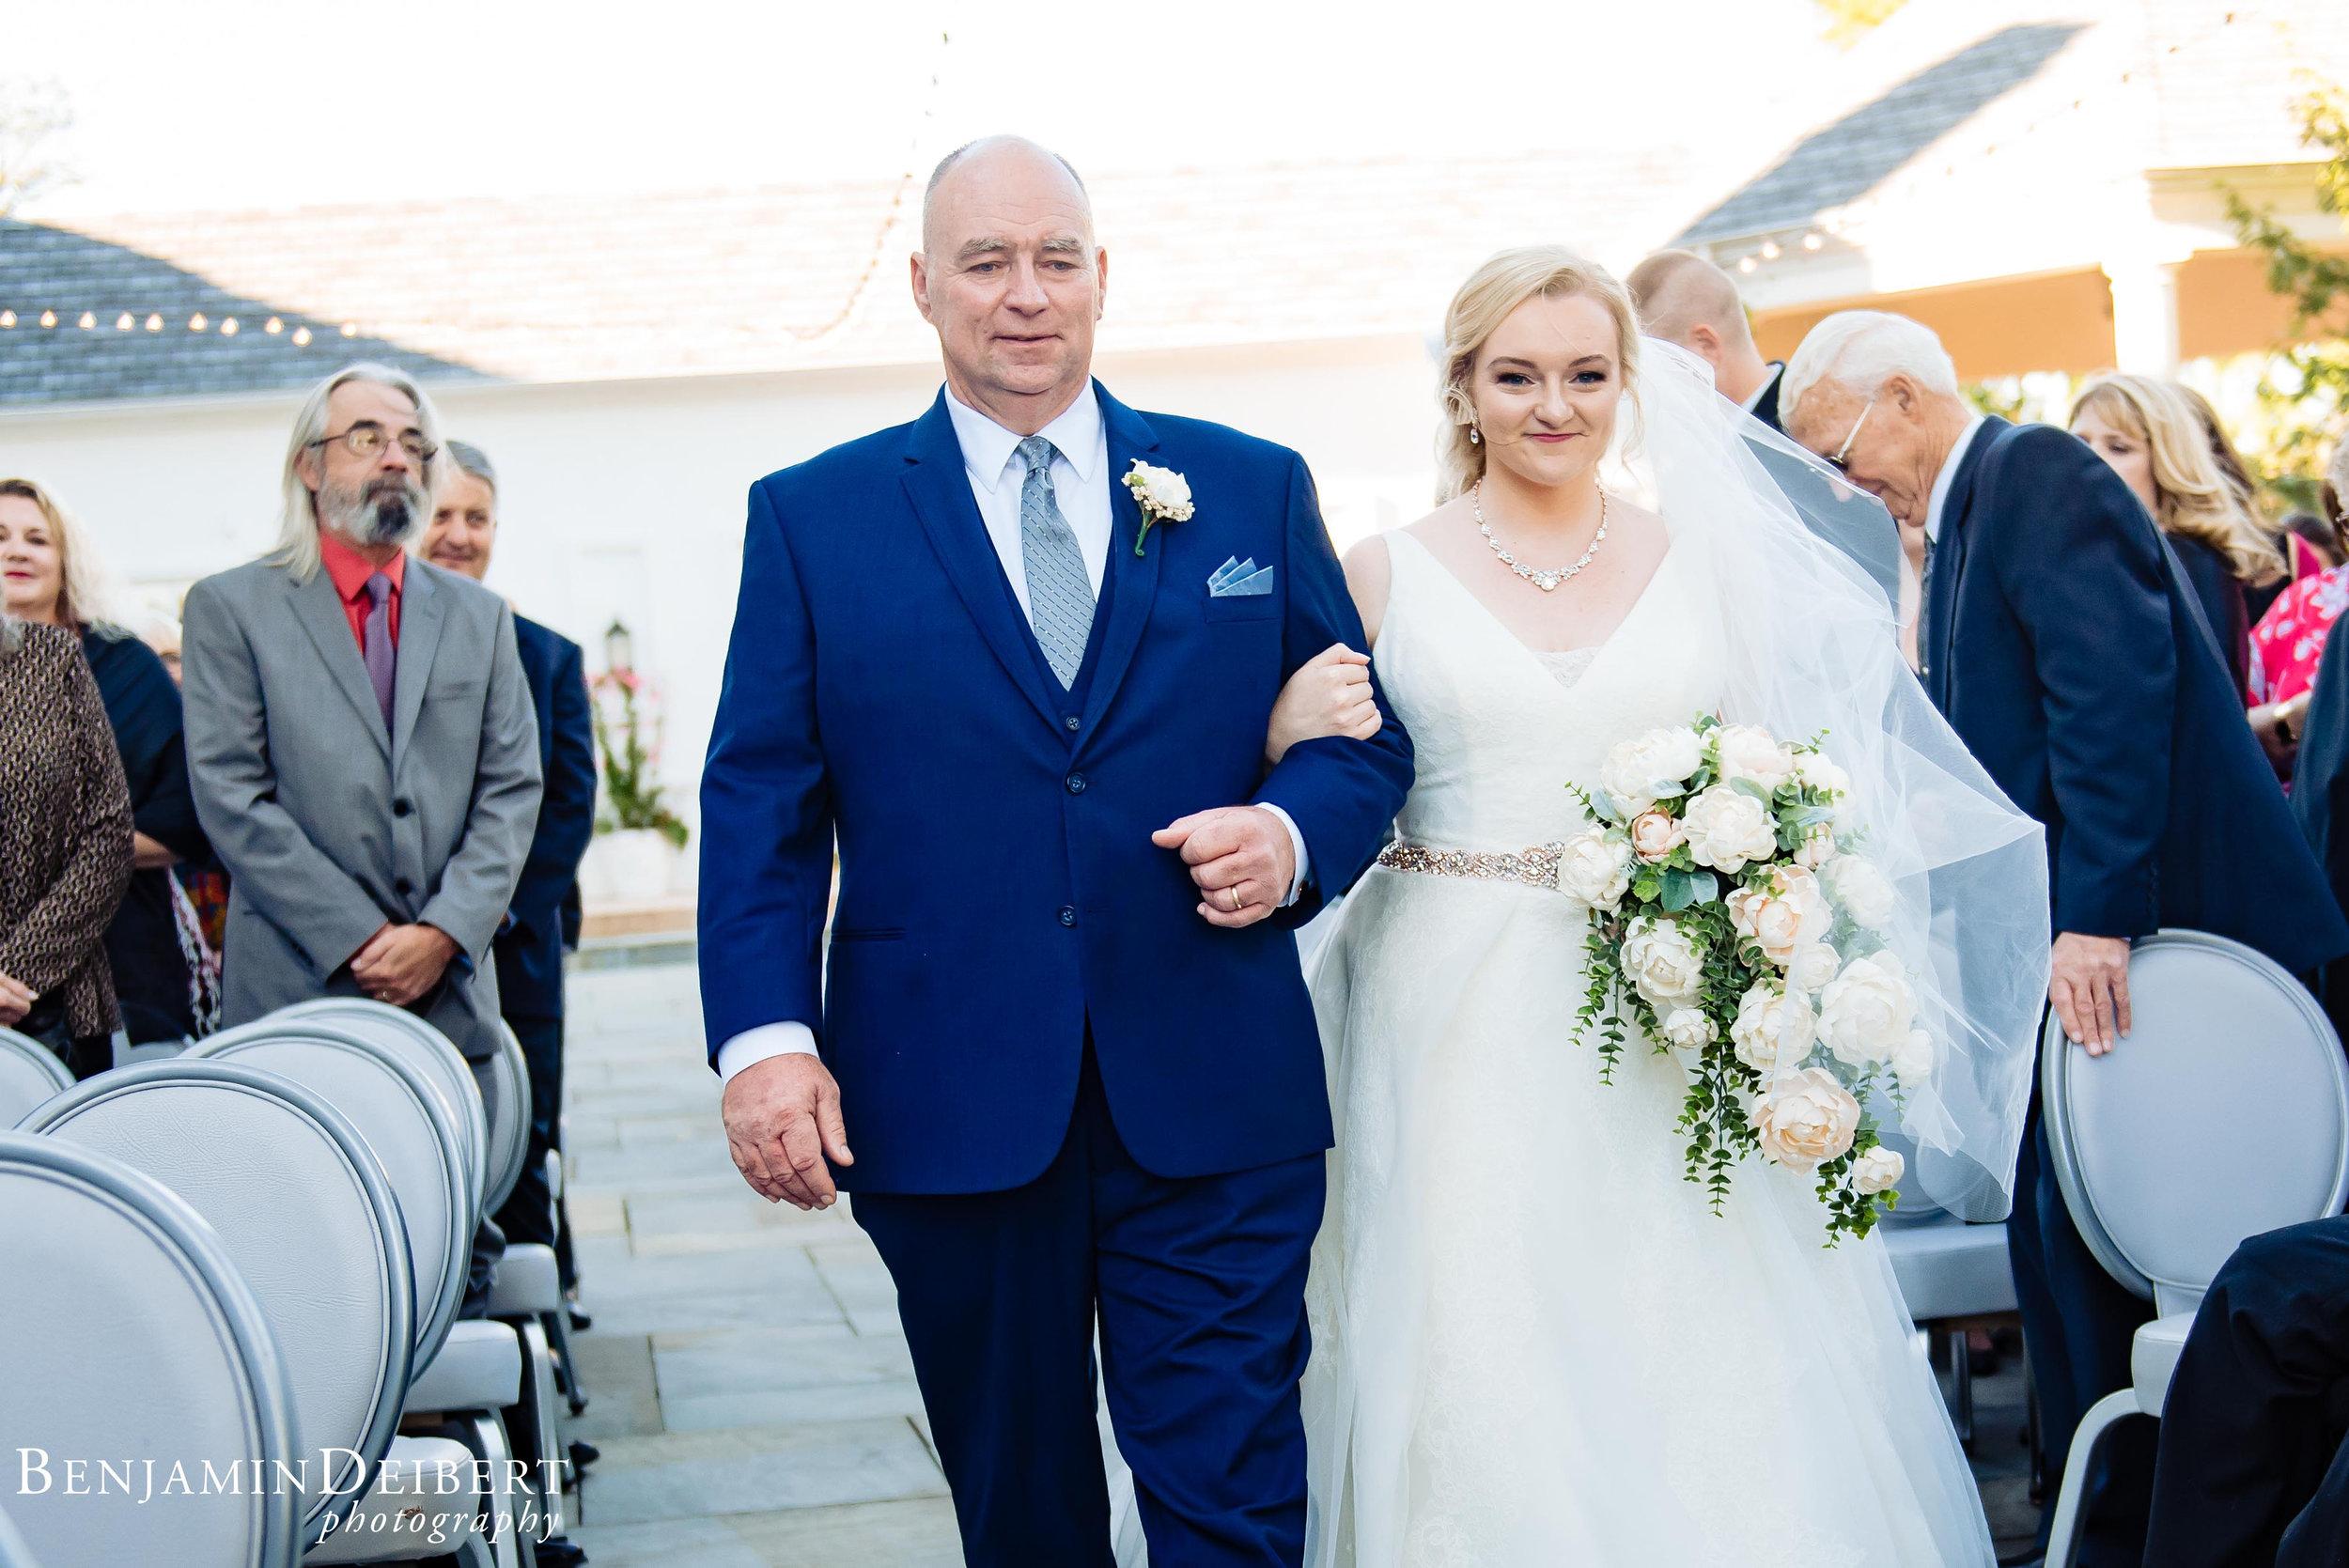 AshleyandDerrick_RadnorValleyCountryClub_Wedding-43.jpg